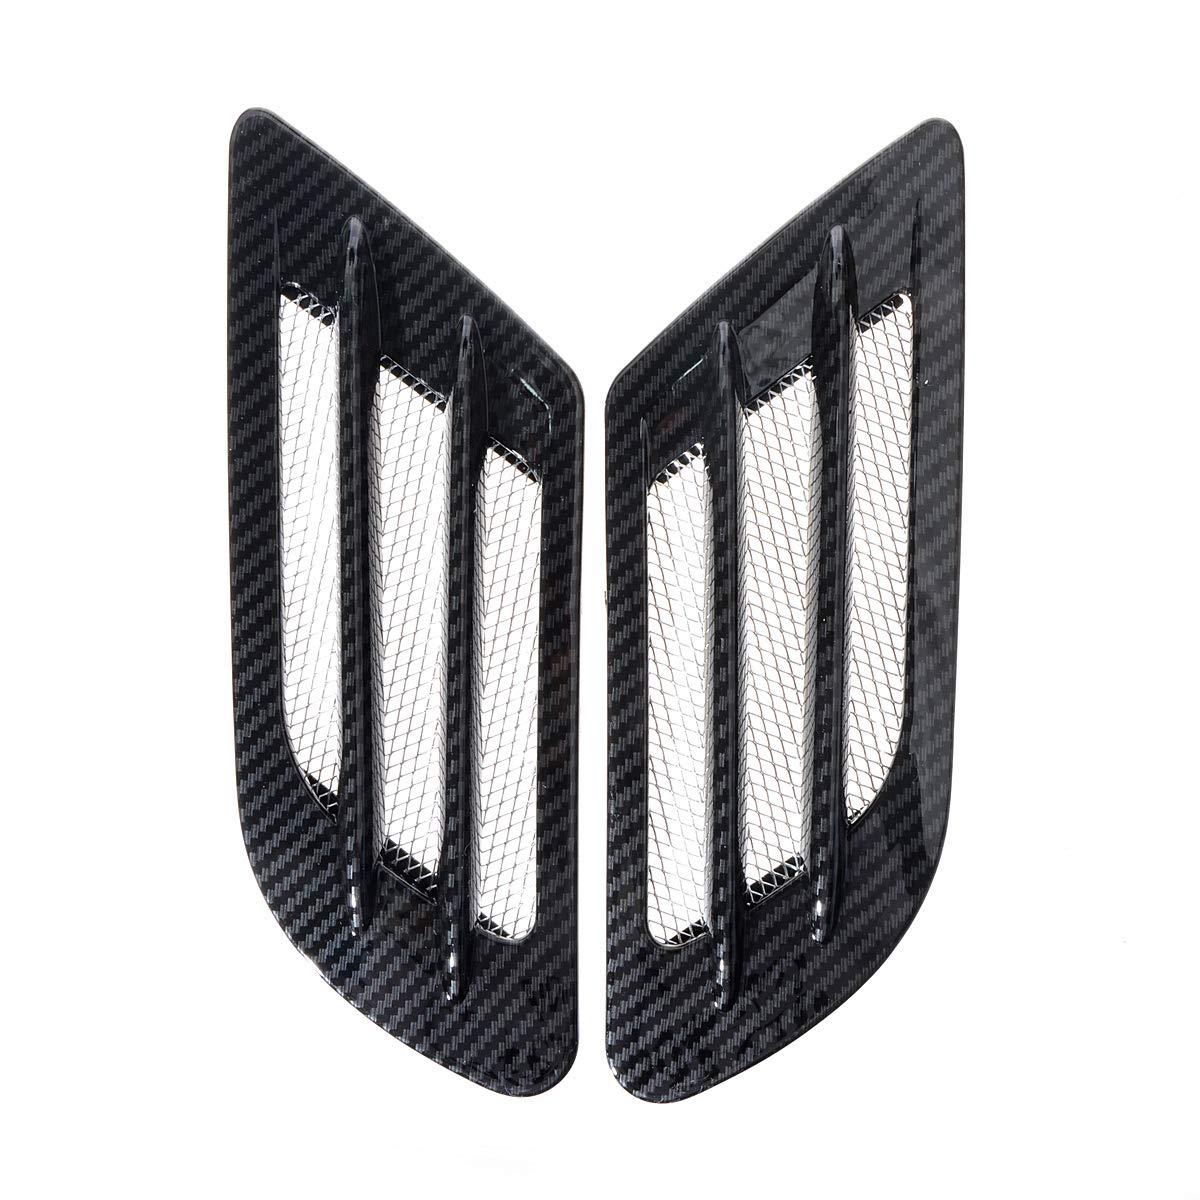 "Black 8.5/"" x 5/"" Fender Air Vent Intake Scoop Bonnet Grill Grille For Mercedes"